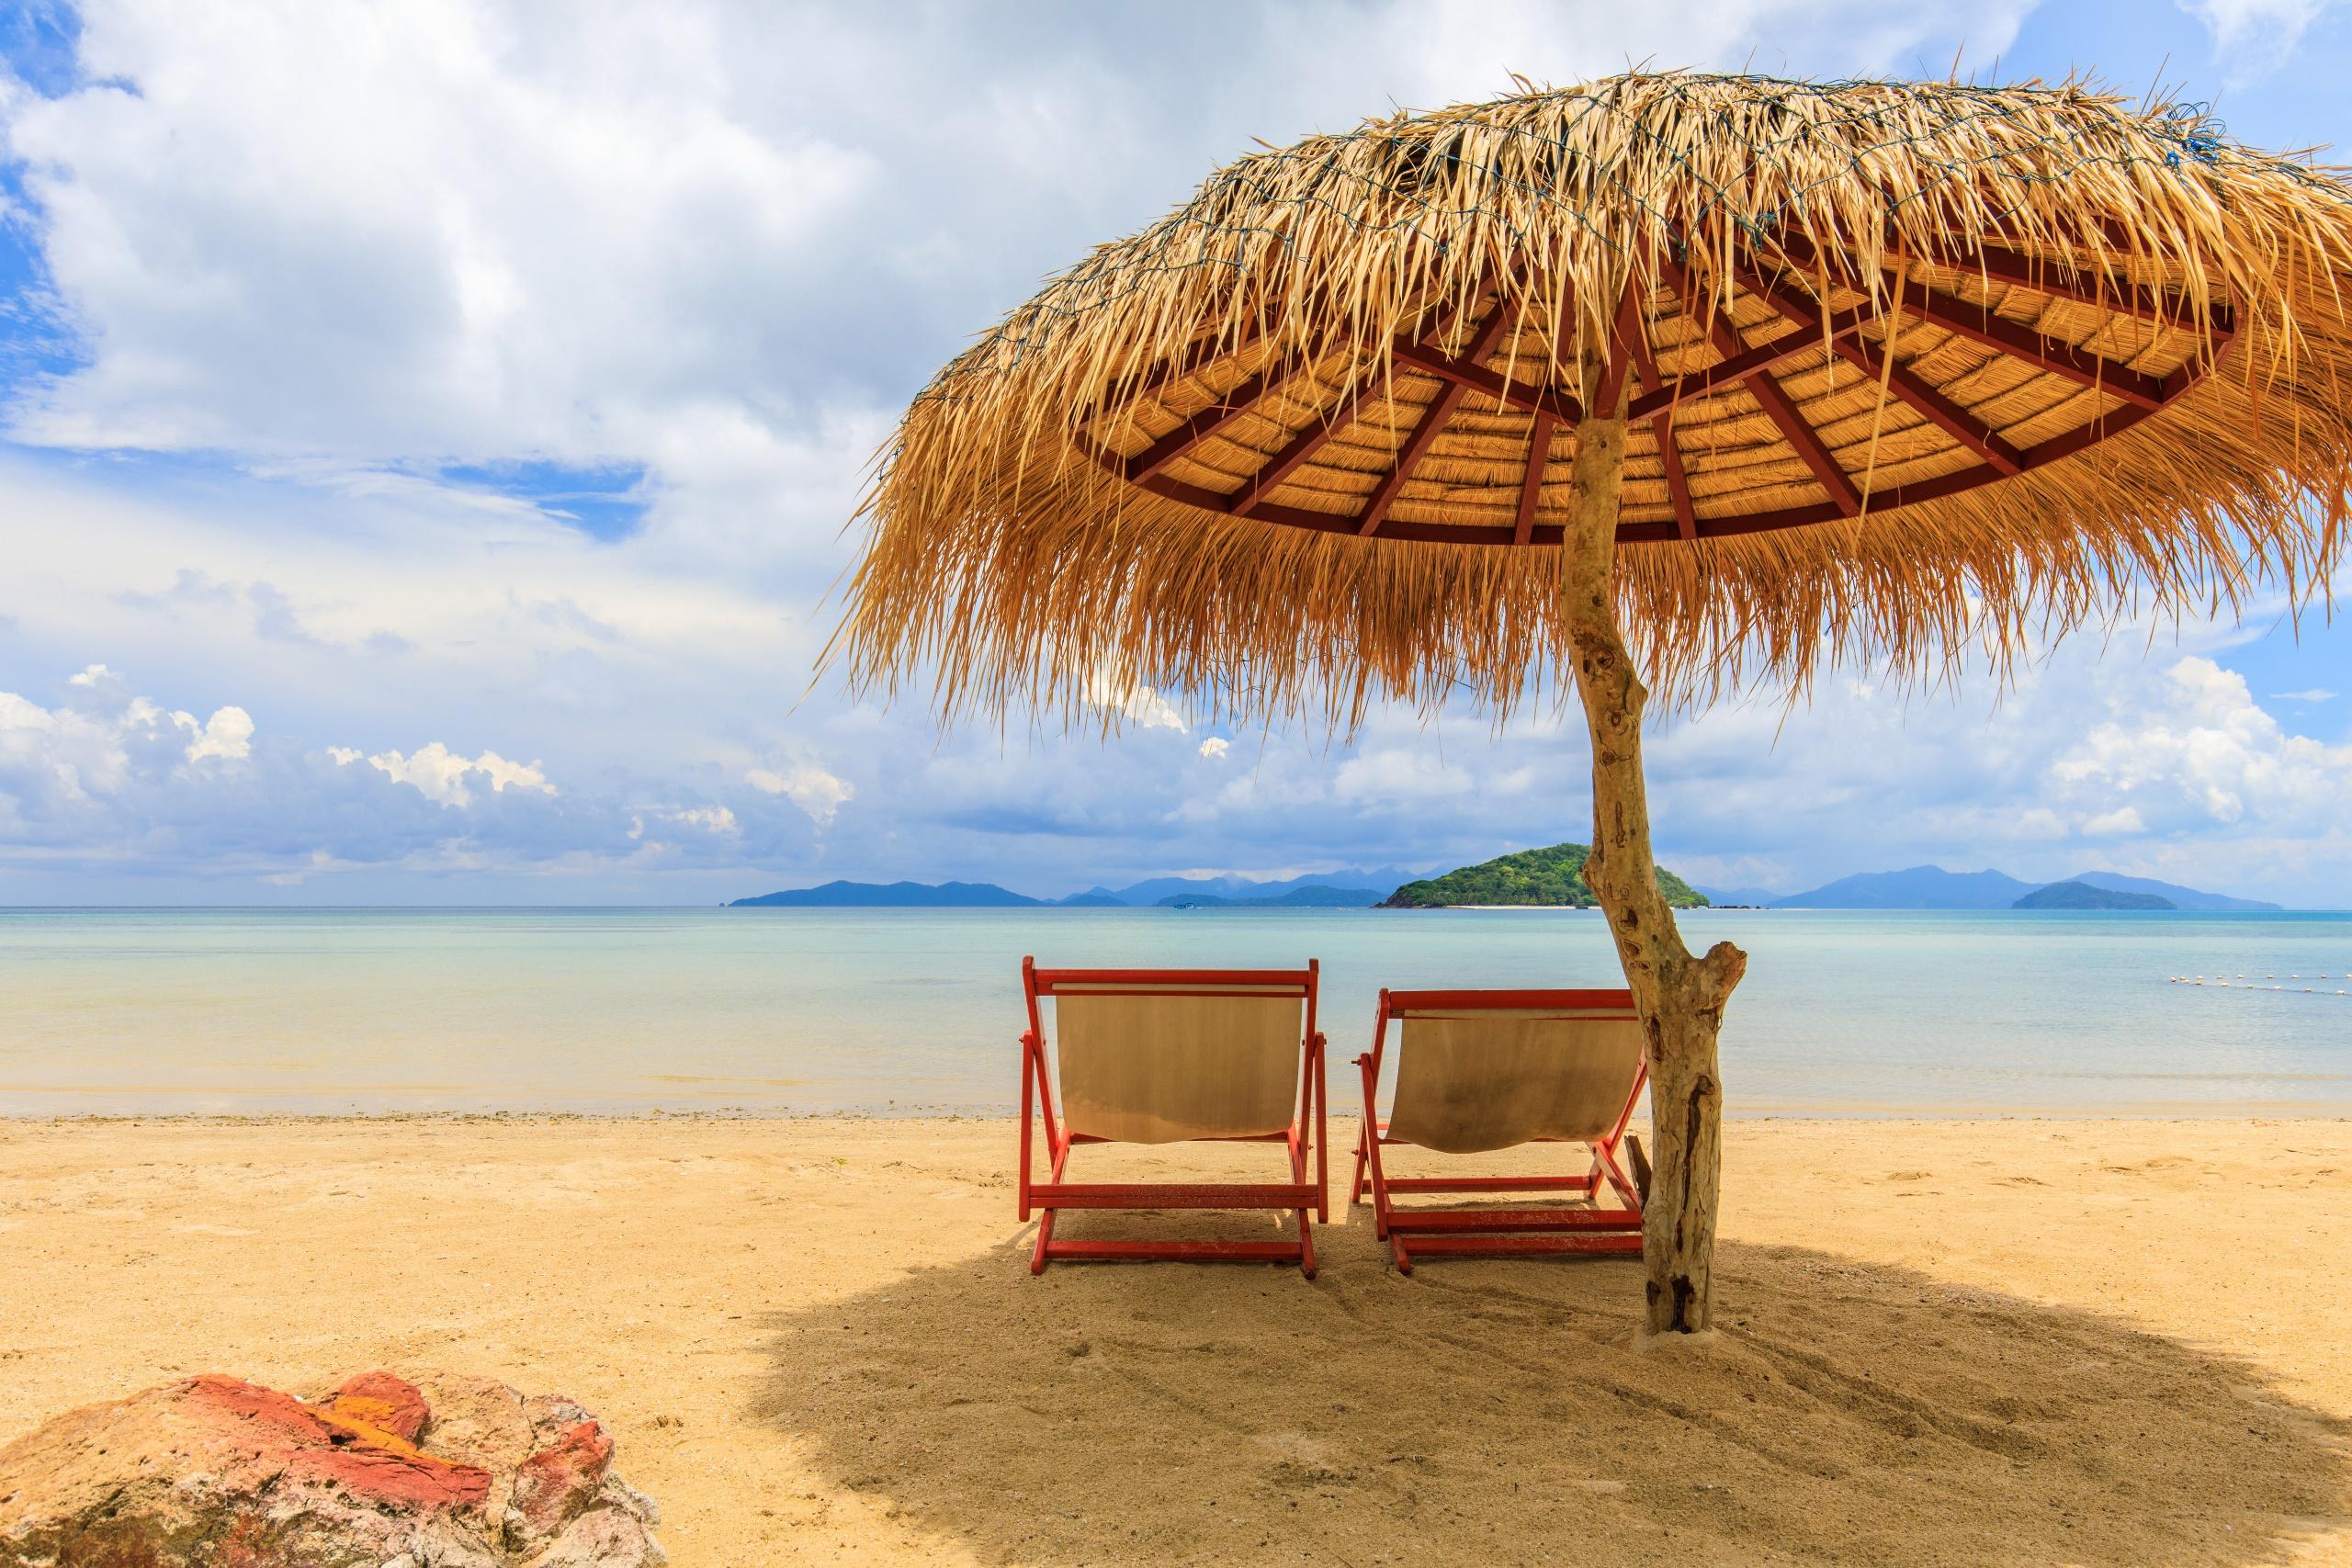 Outdoors Beach Sky Sea Deck Chairs 2560x1707